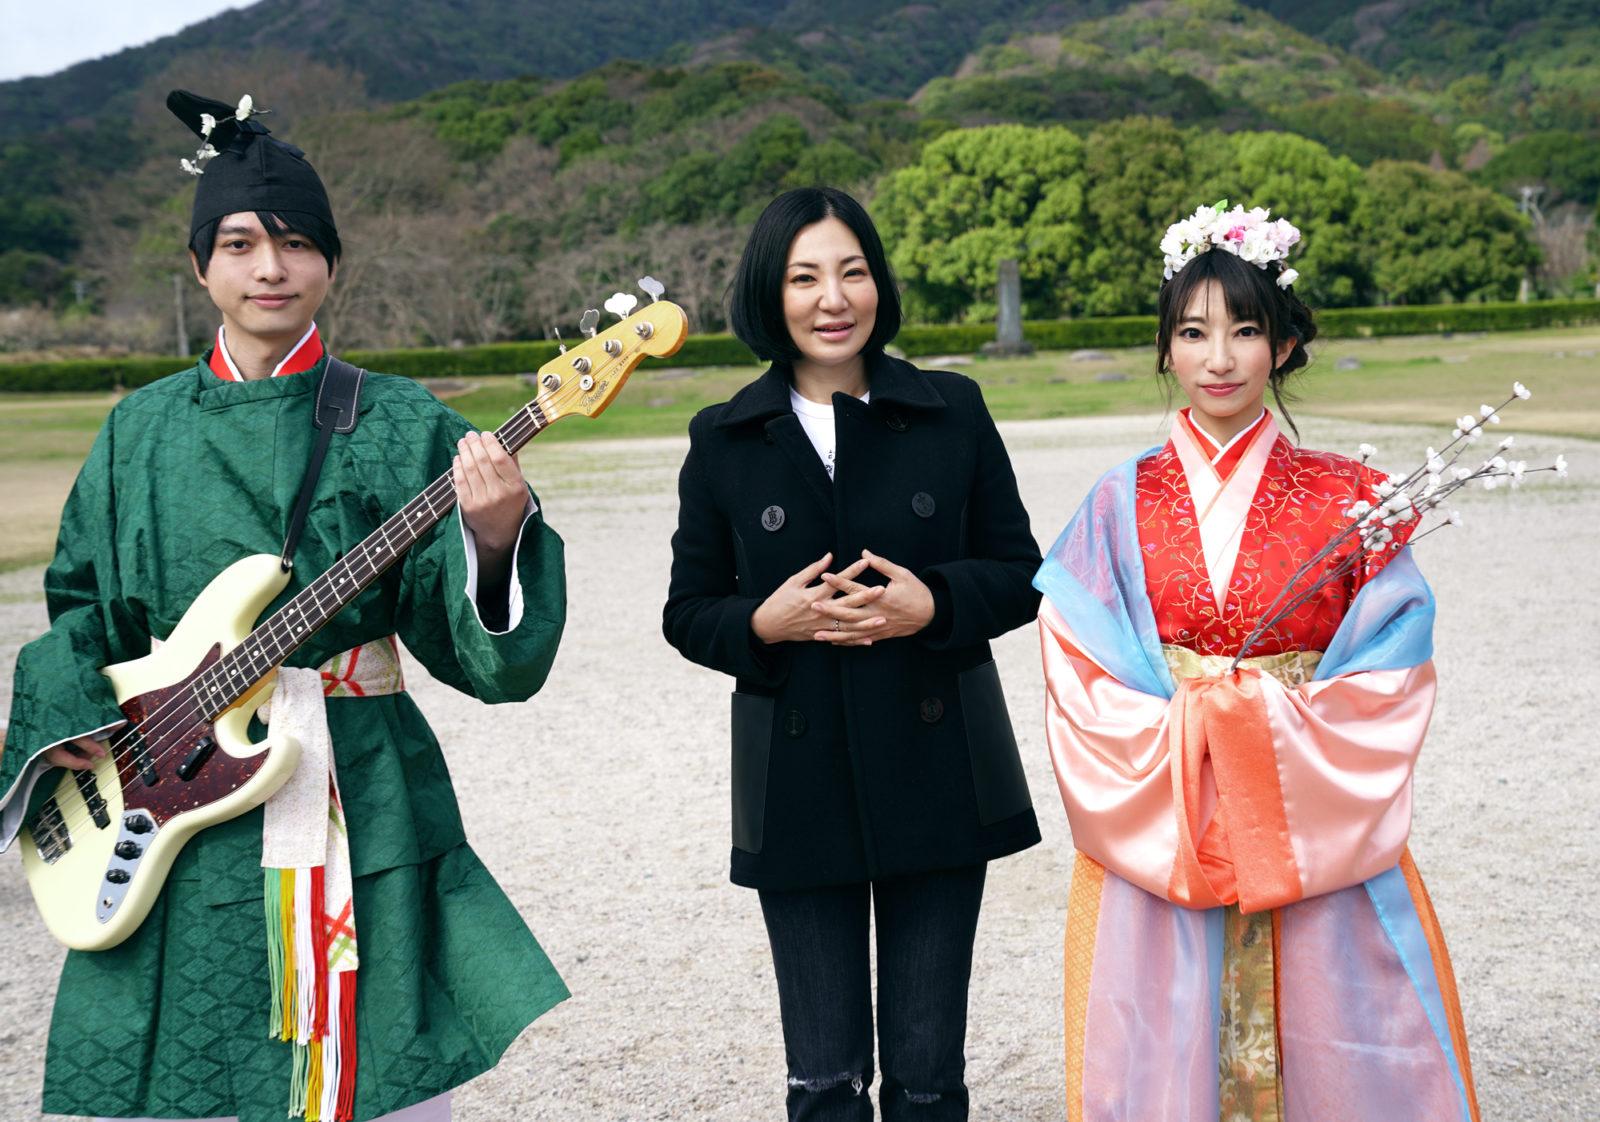 Neontetra、太宰府イメージソングPVに広瀬香美ゲスト出演決定サムネイル画像